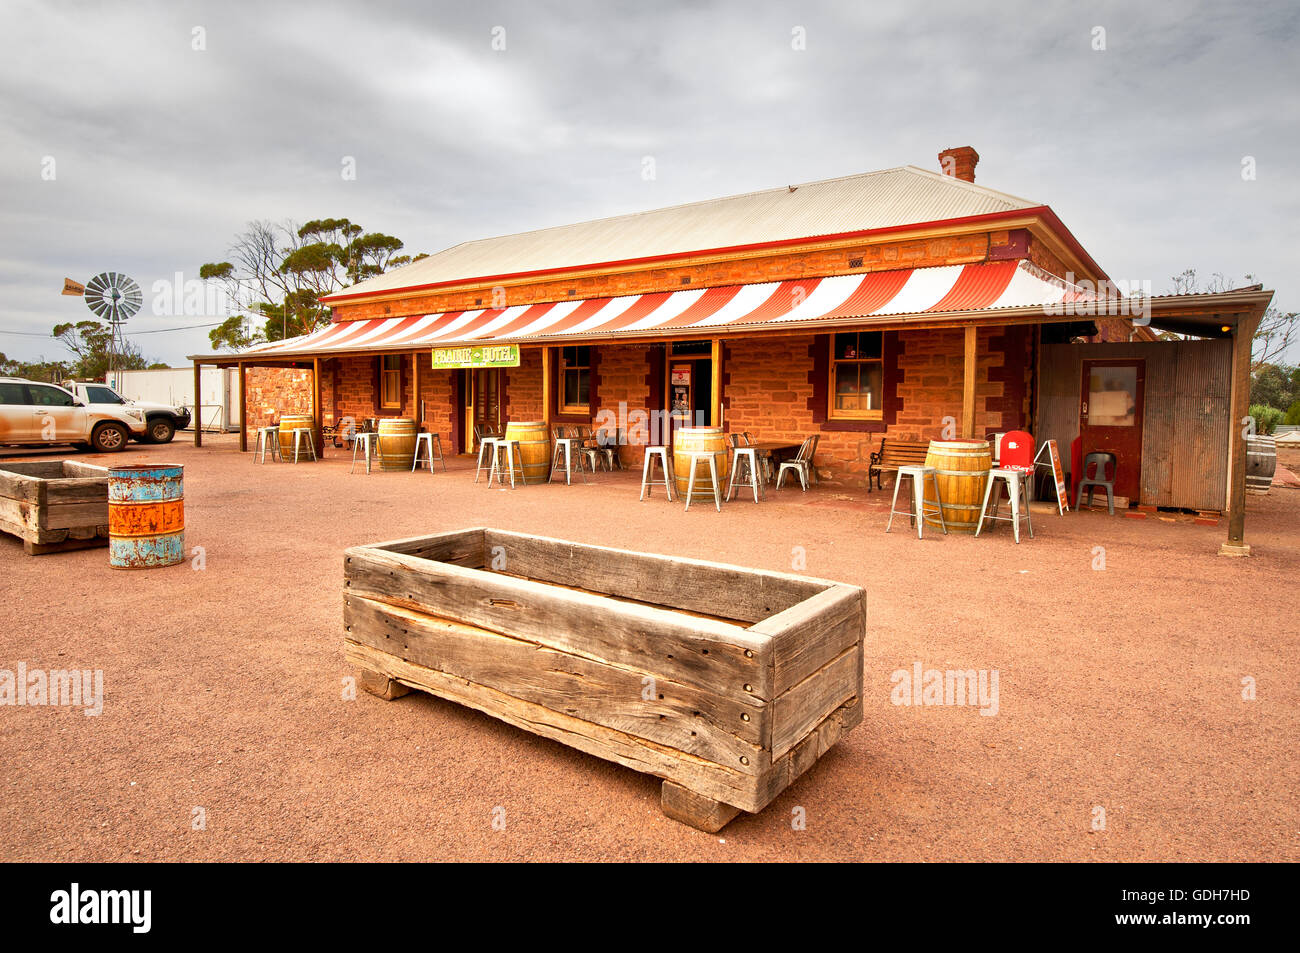 Prairie Hotel in Parachilna, an outback icon in South Australia. Stock Photo